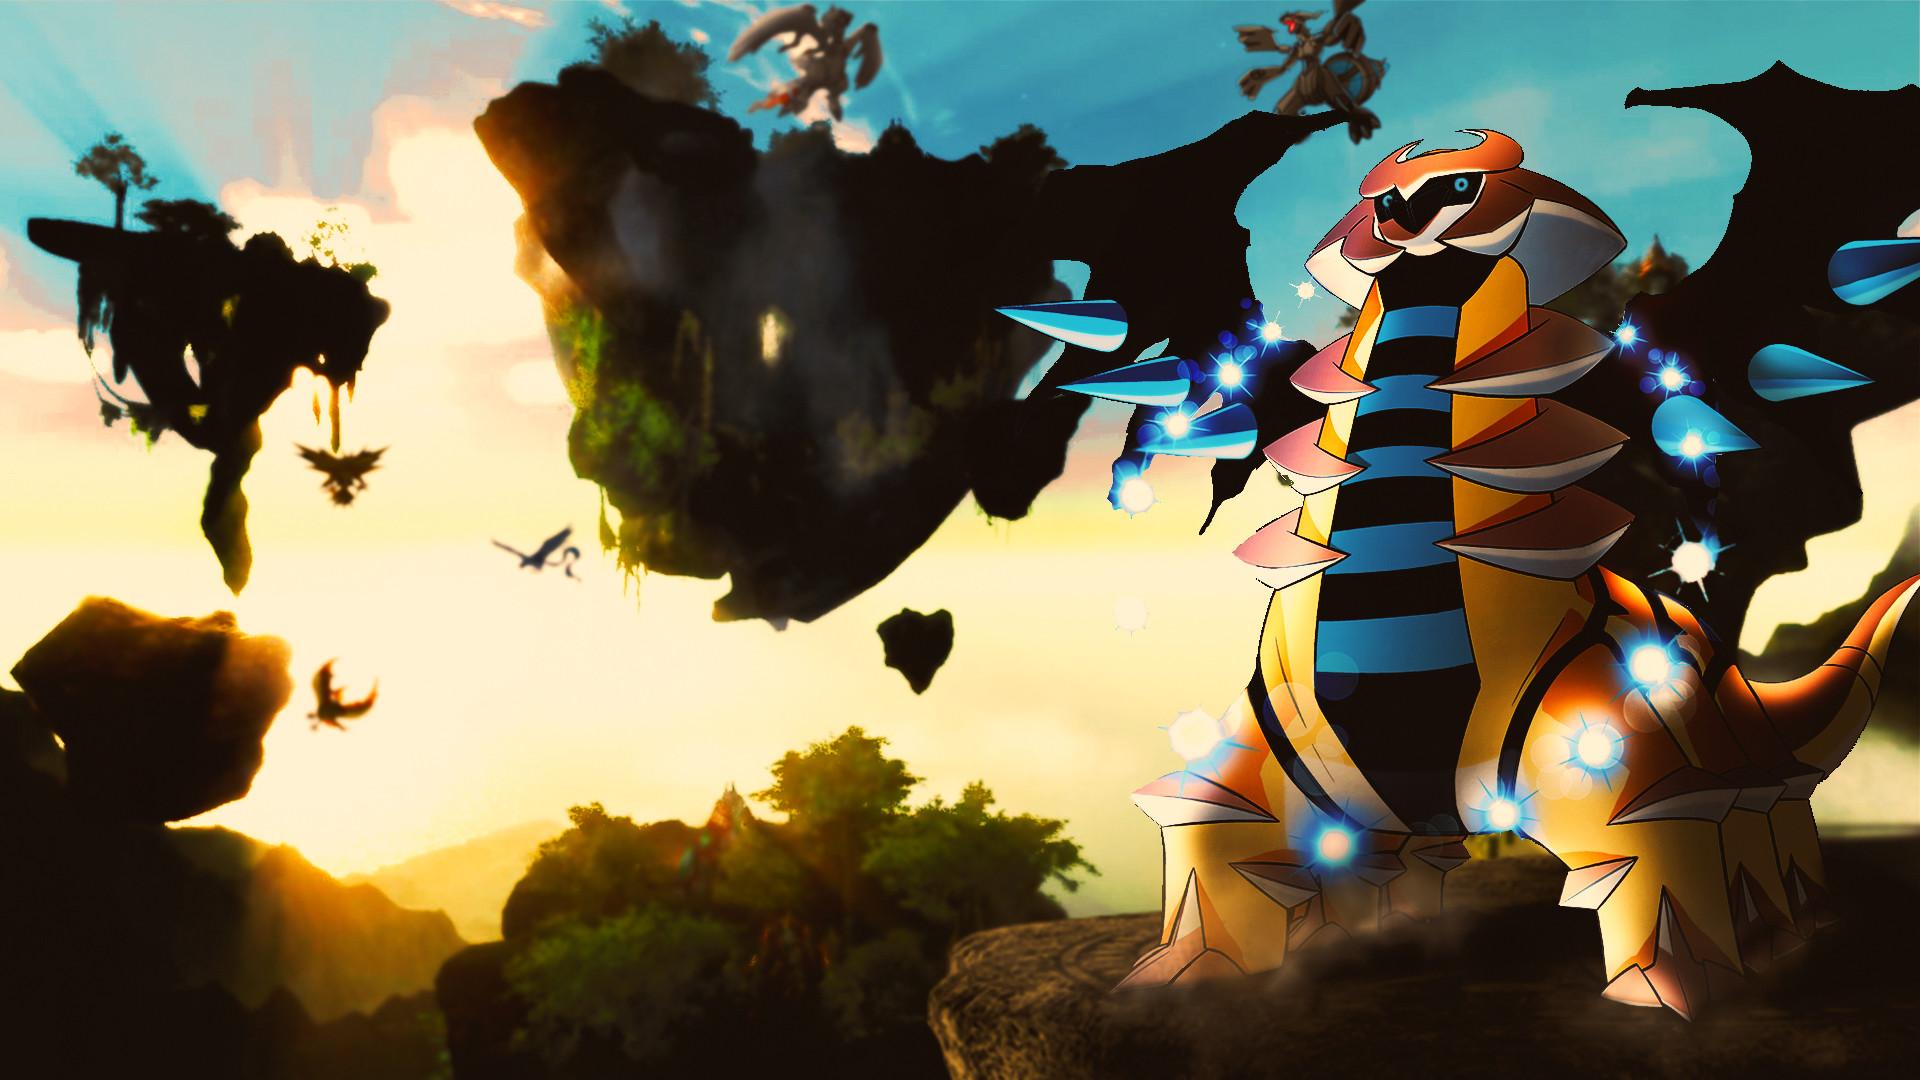 … Giratina [Altered, Shiny] – Pokemon Wallpaper by ShojiZenshin